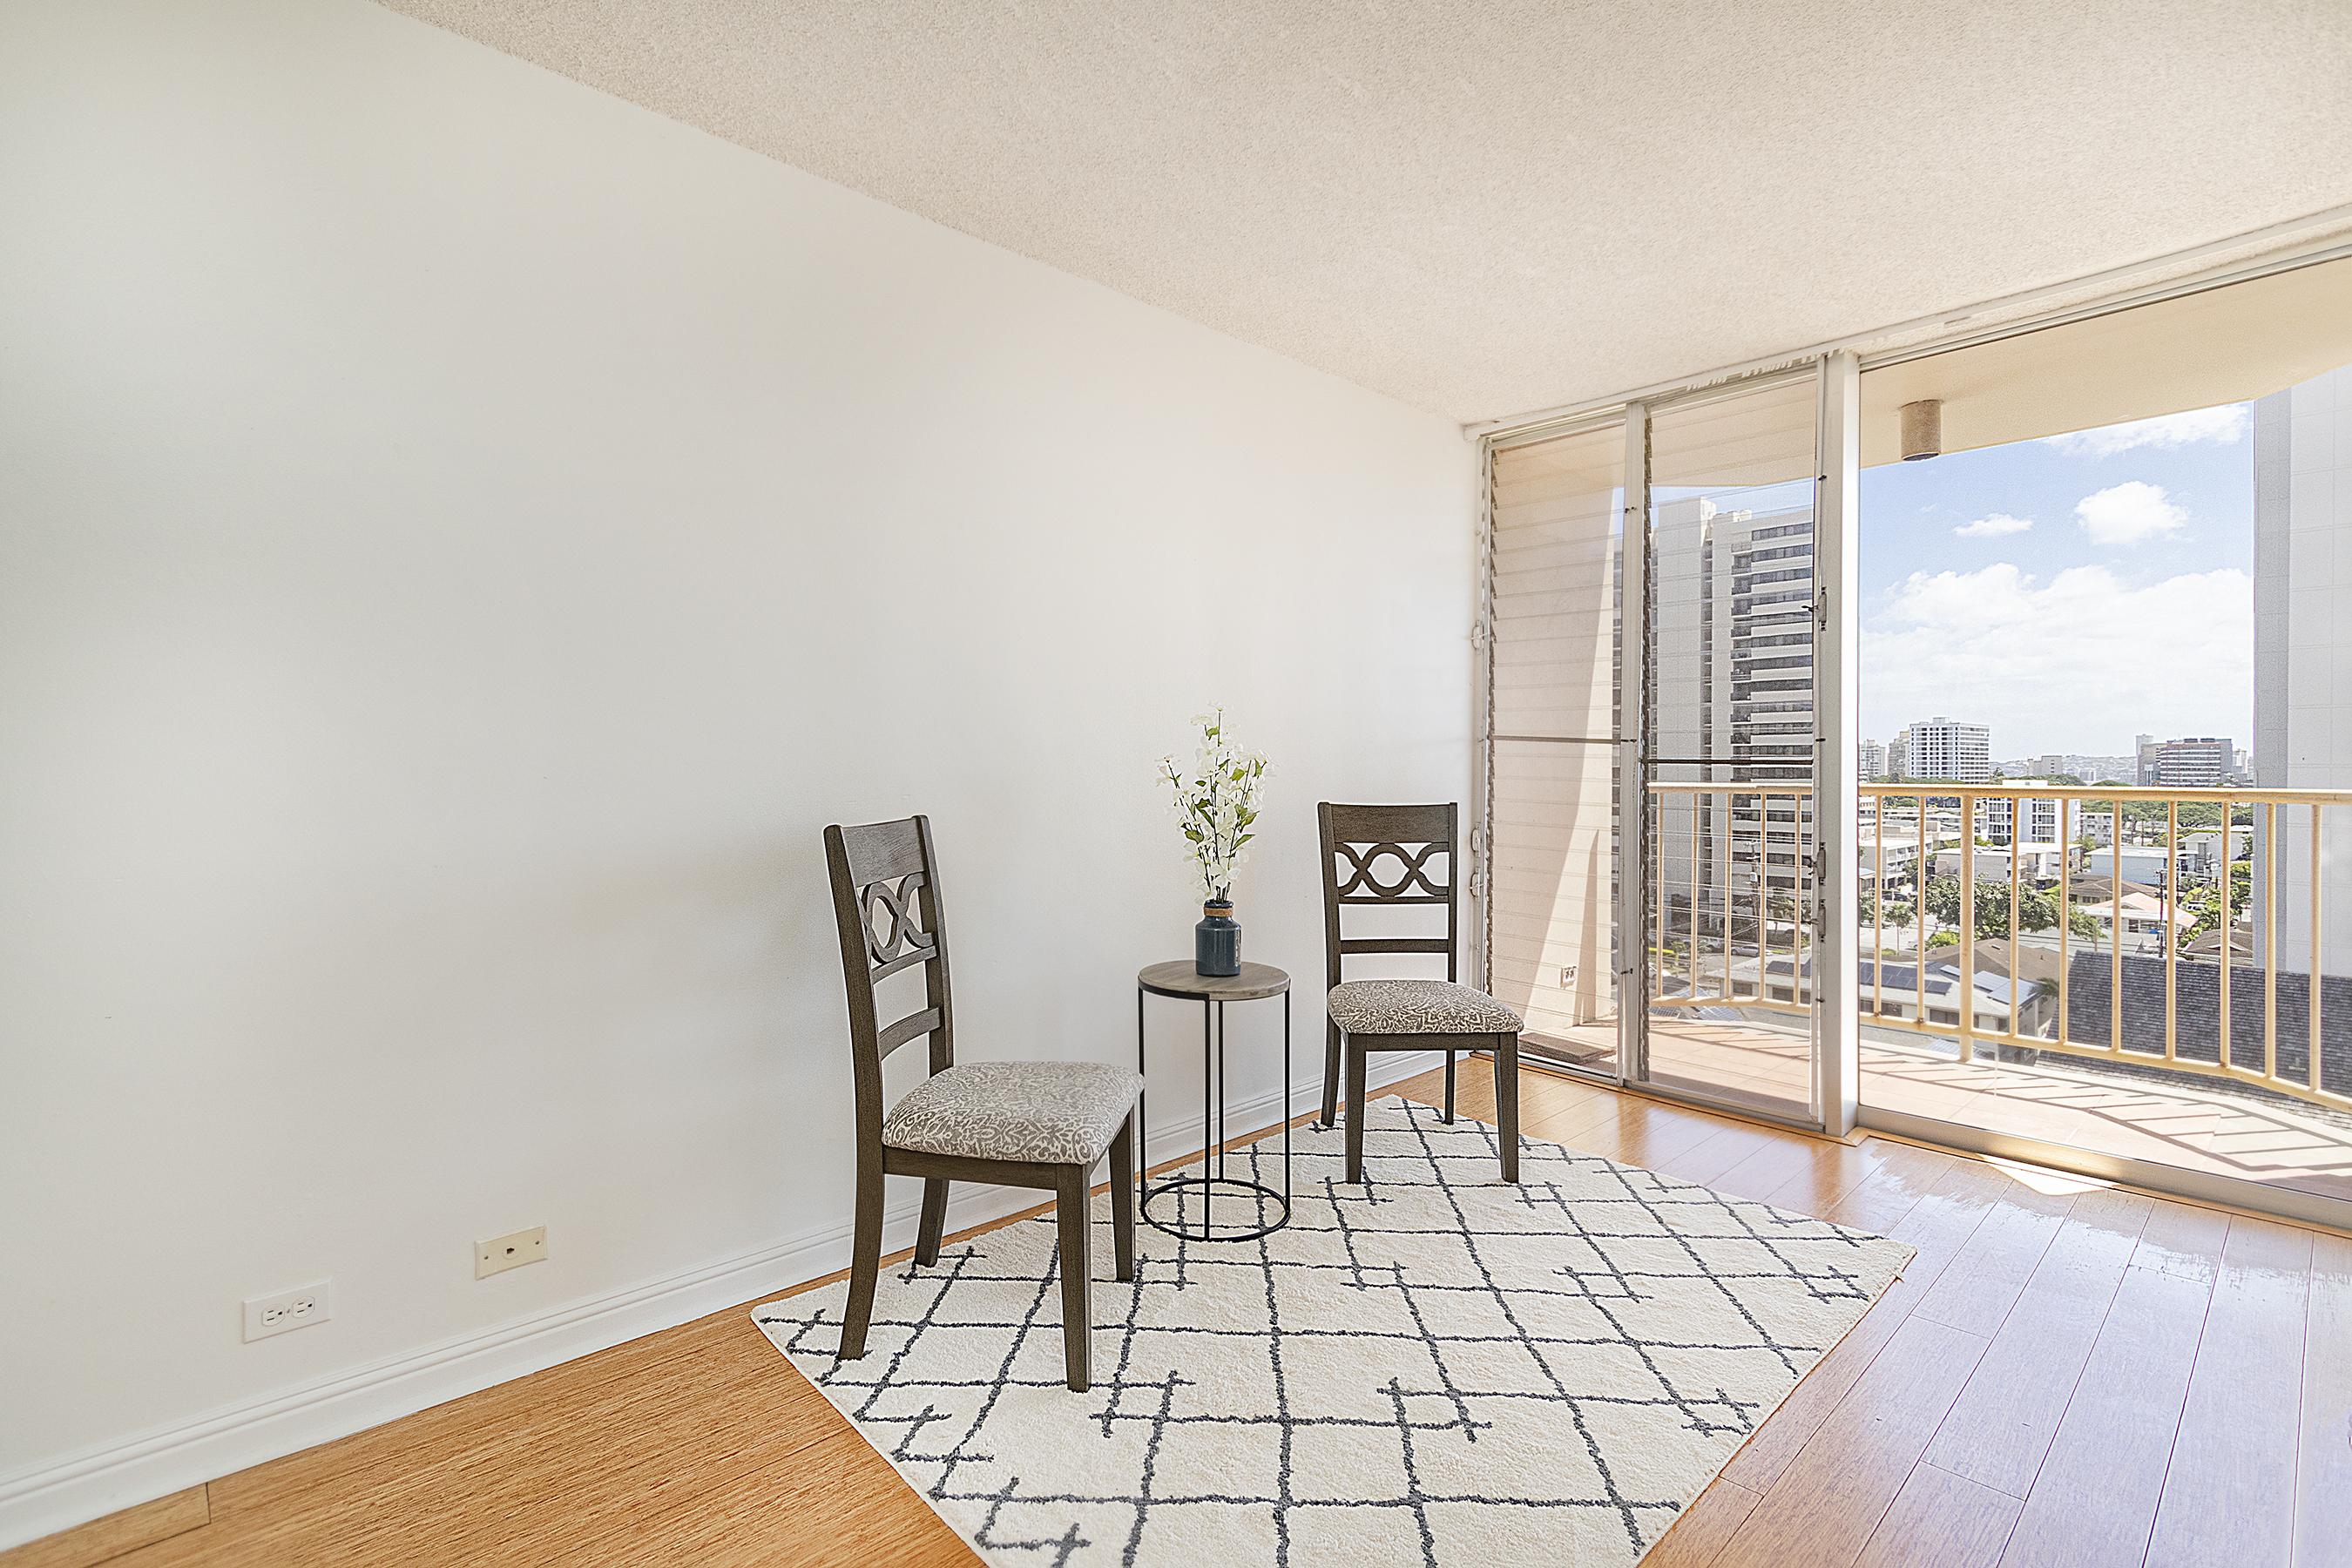 Living room and lanai view at 1535 Pensacola St #711, Honolulu, HI 96822